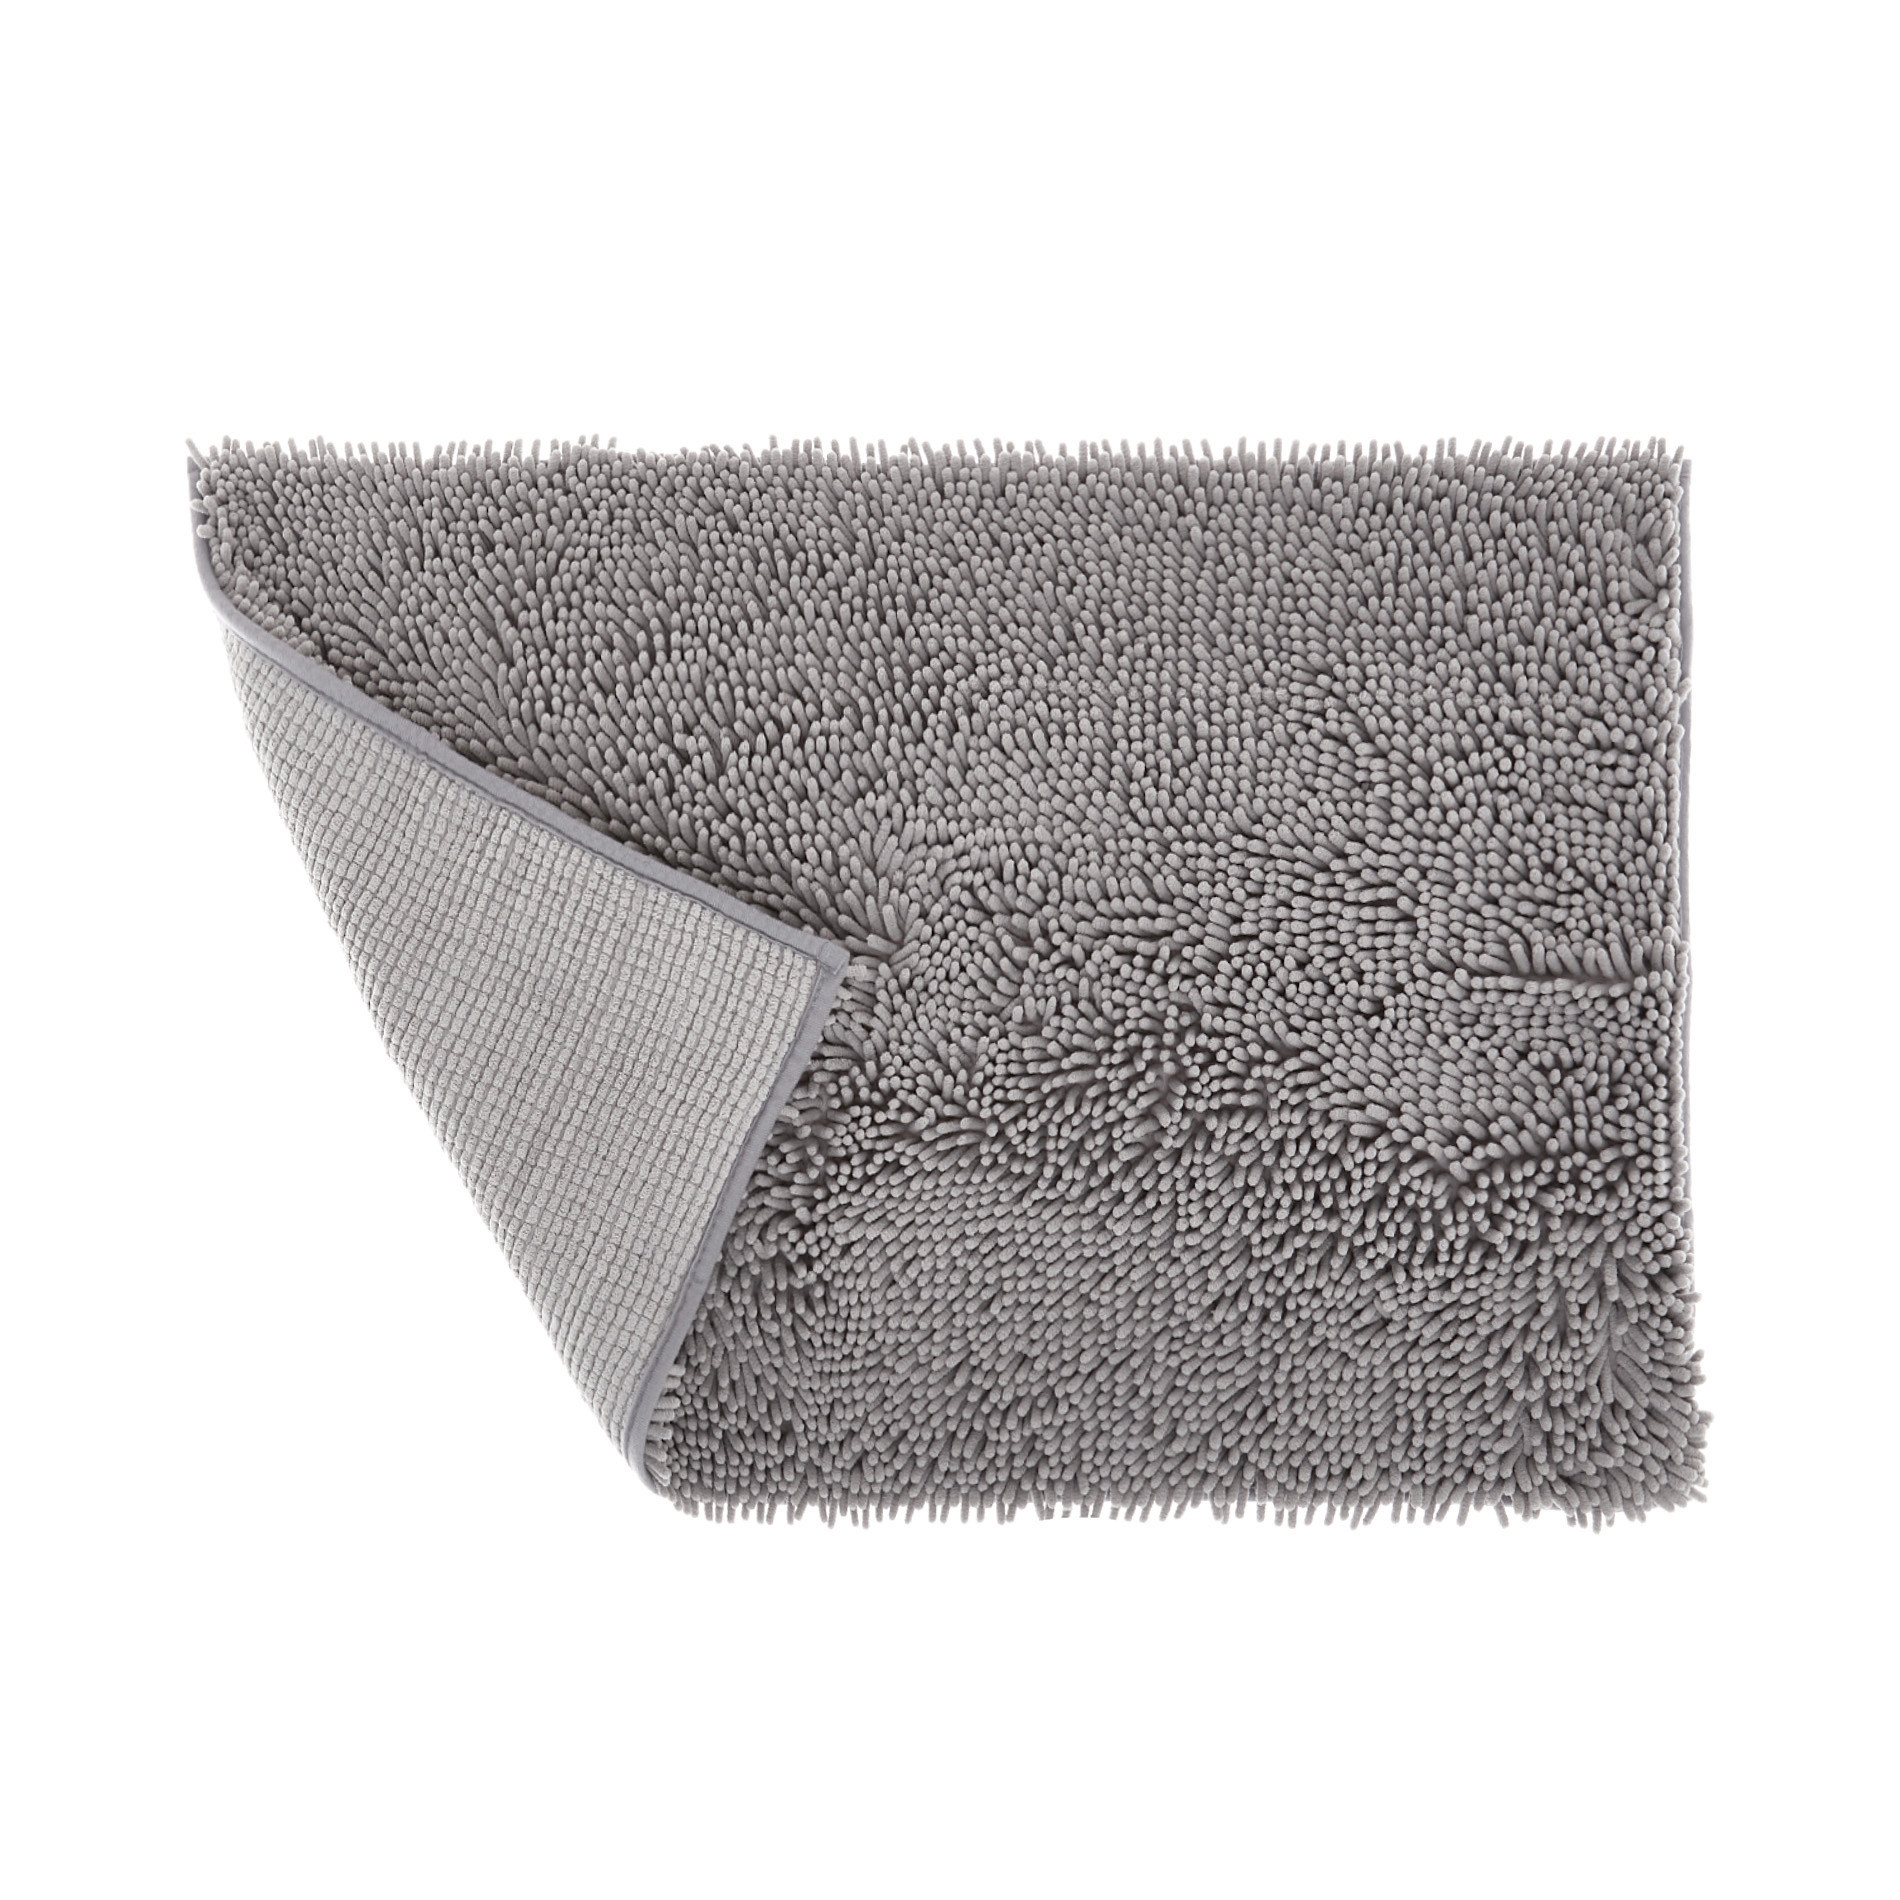 Tappeto bagno microfibra shaggy, Grigio, large image number 1